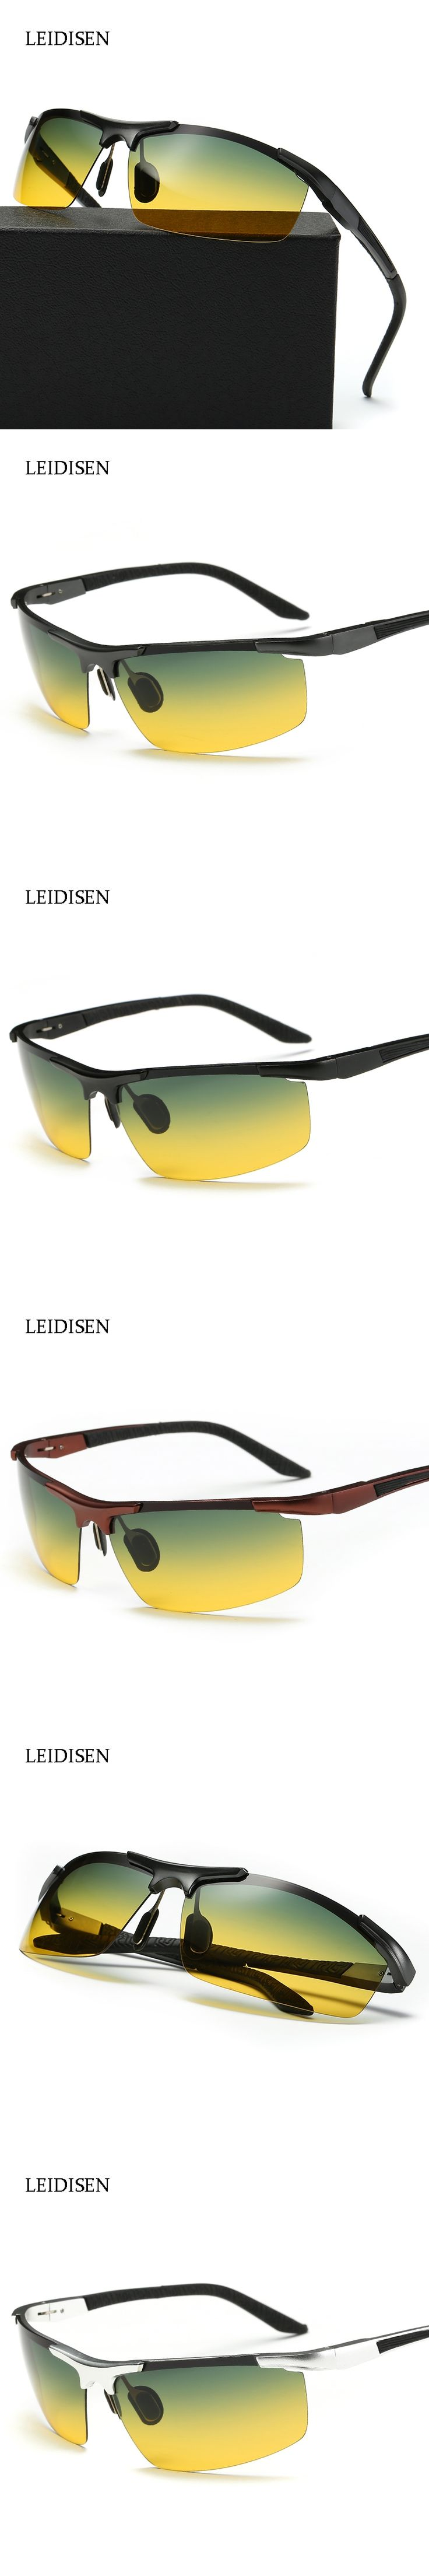 Aluminum Magnesium Men's Polarized Sun glasses Police Sunglasses Night Vision Mirror Male Eyewear  Goggle Oculos For Men